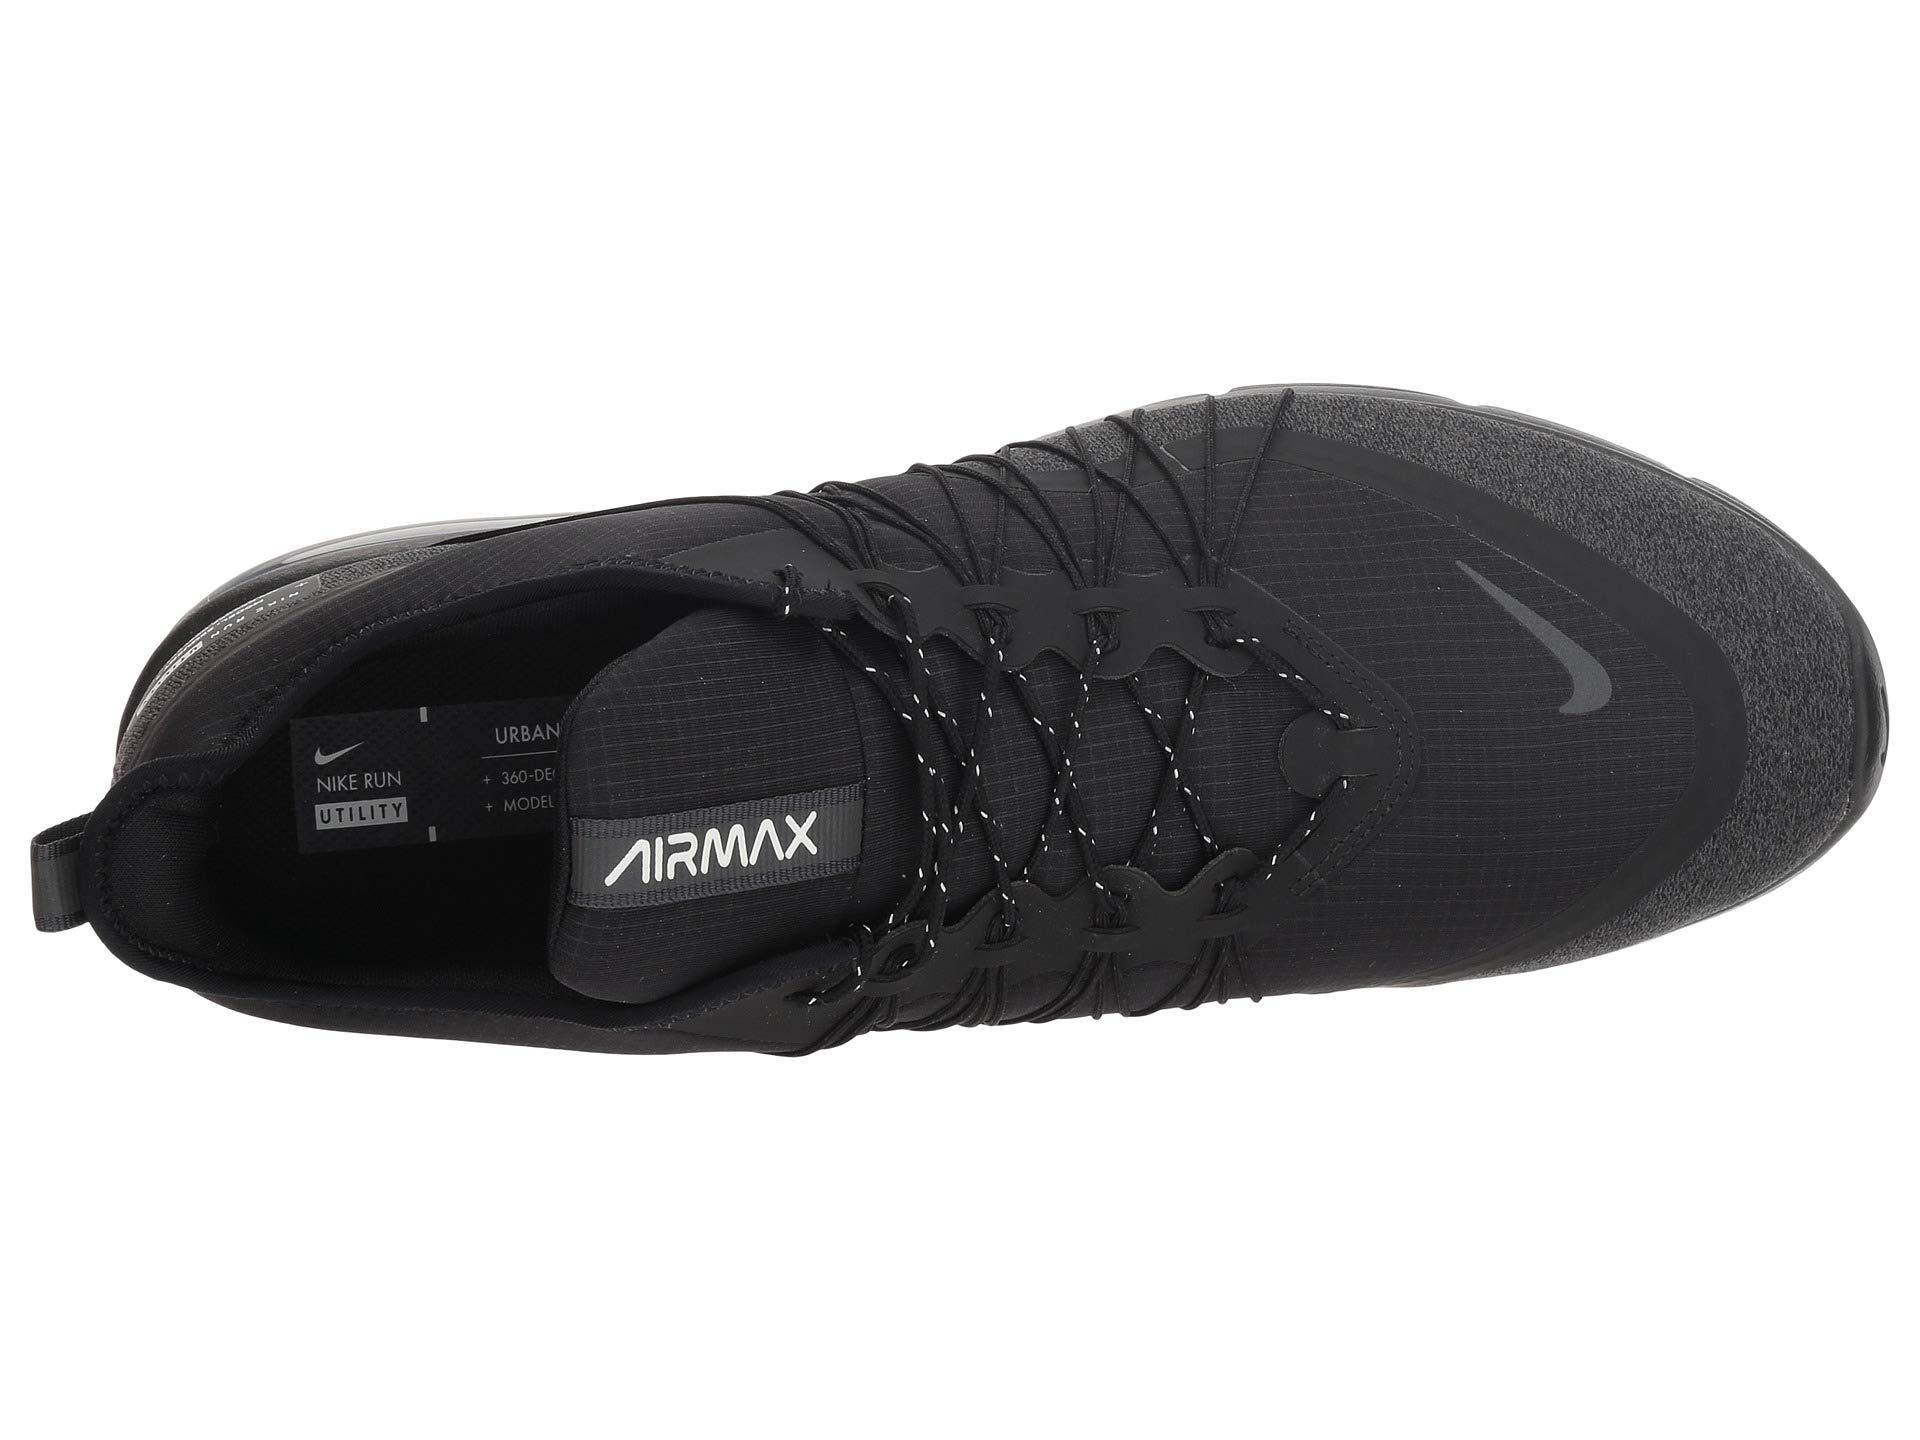 263148591a7 Air Max Sequent 4 Shield (black/metallic Silver/dark Grey) Men's Running  Shoes